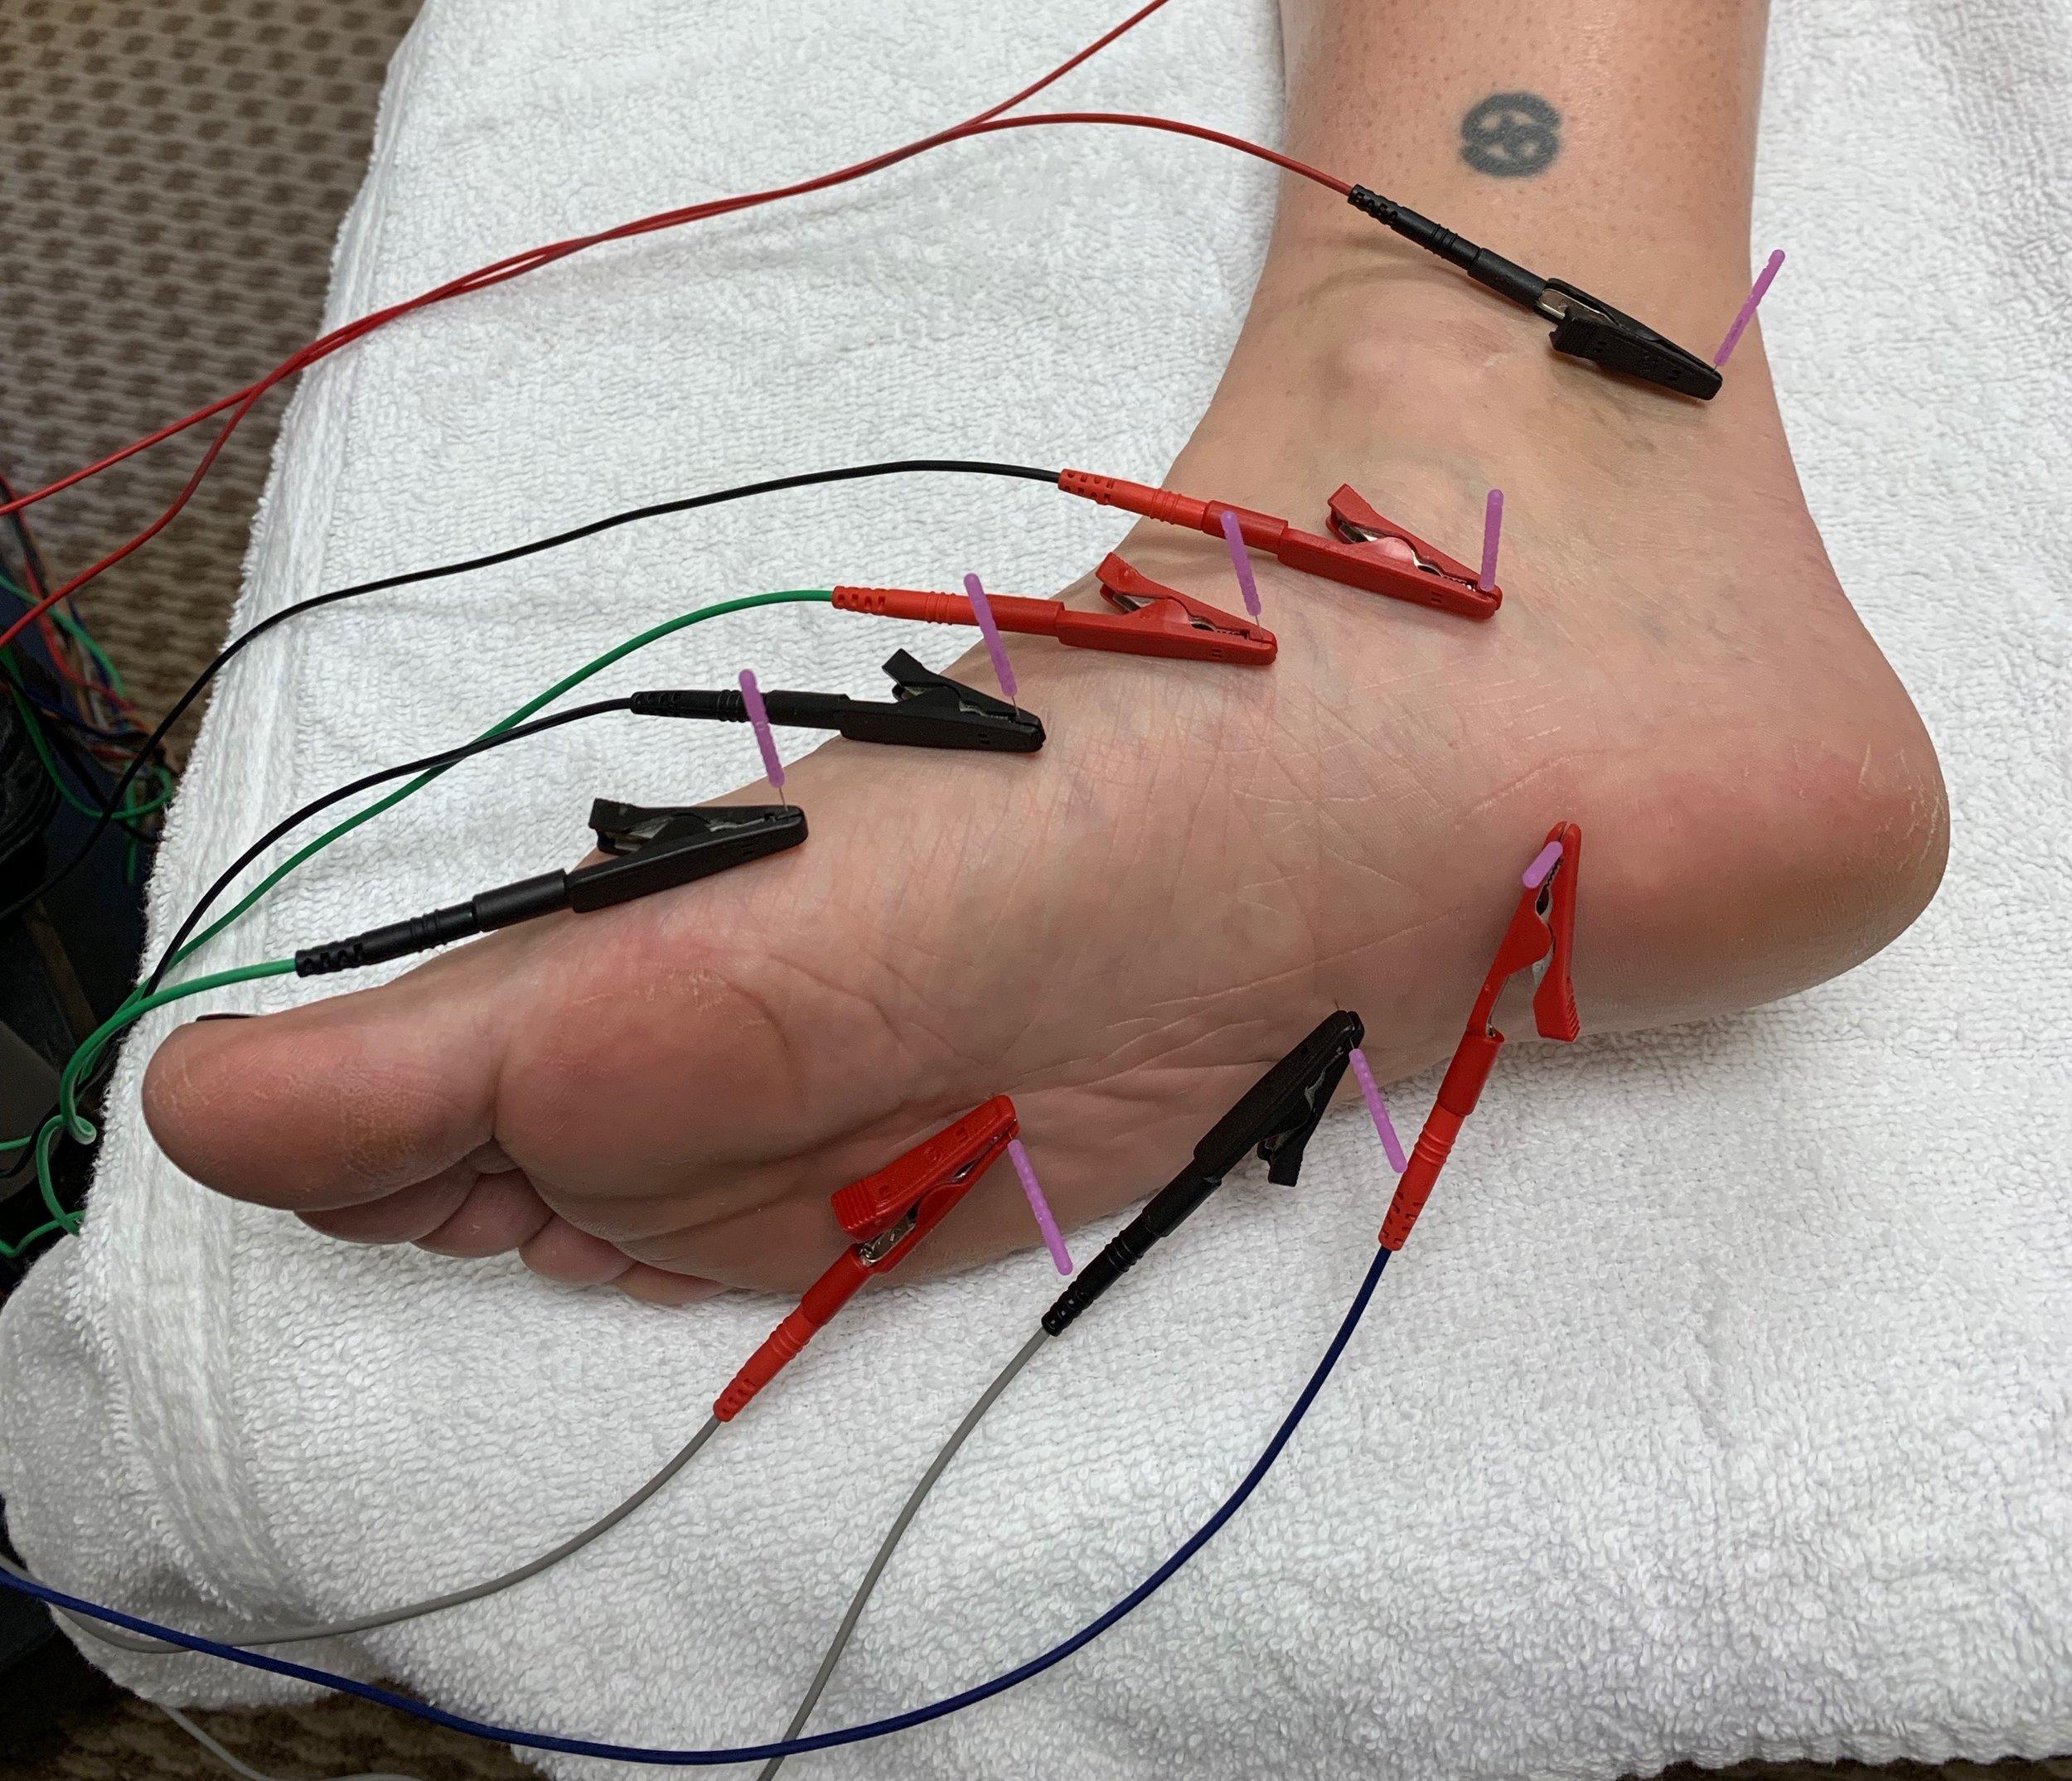 Dry Needling for plantar fasciitis, foot pain, heel pain